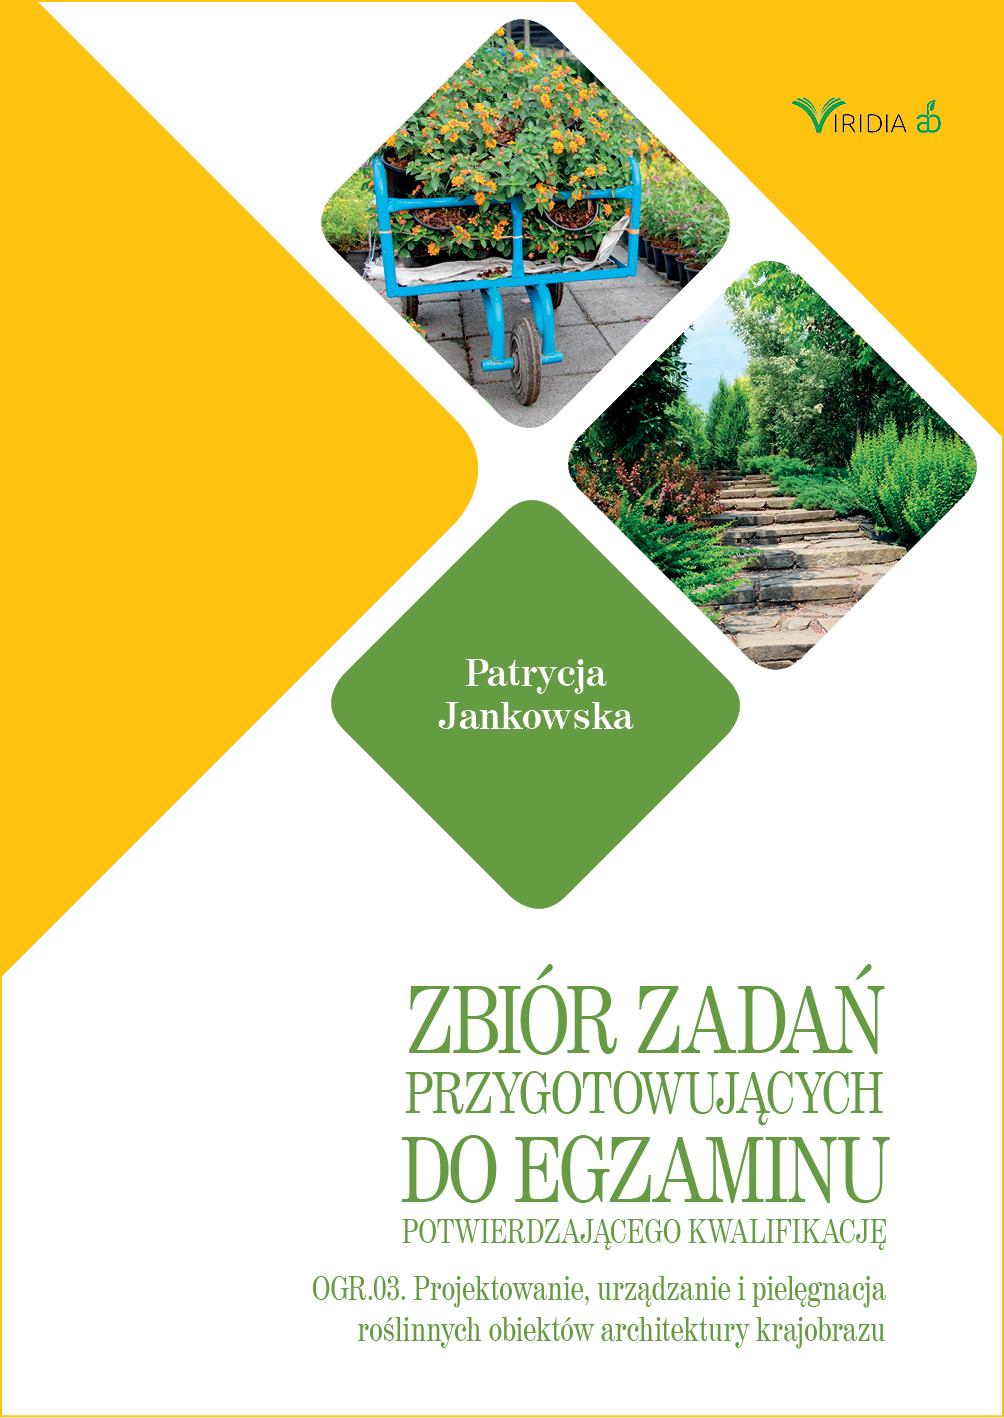 zbior_zadan_ogr_03_okladka